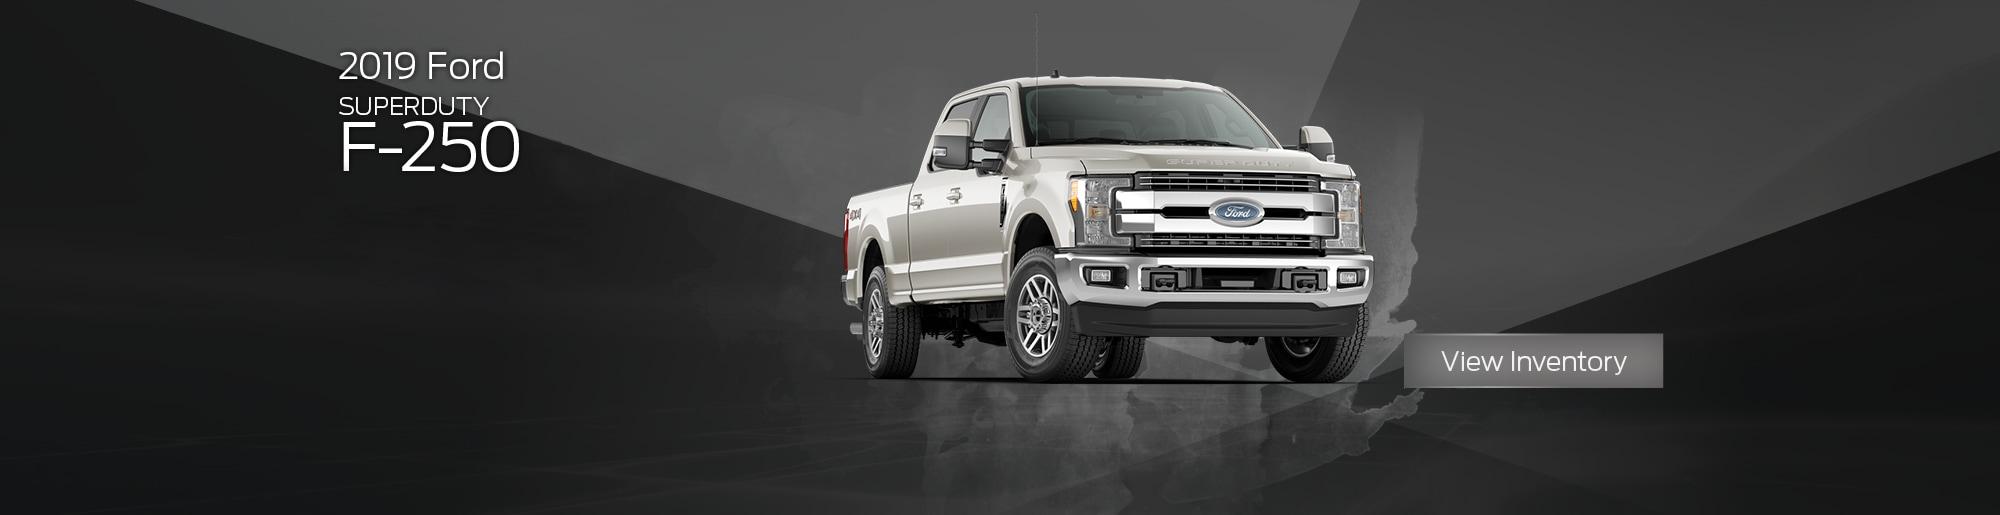 Gmc Dealership Baton Rouge >> Robinson Brothers Ford Lincoln | Ford Dealership in Baton Rouge LA